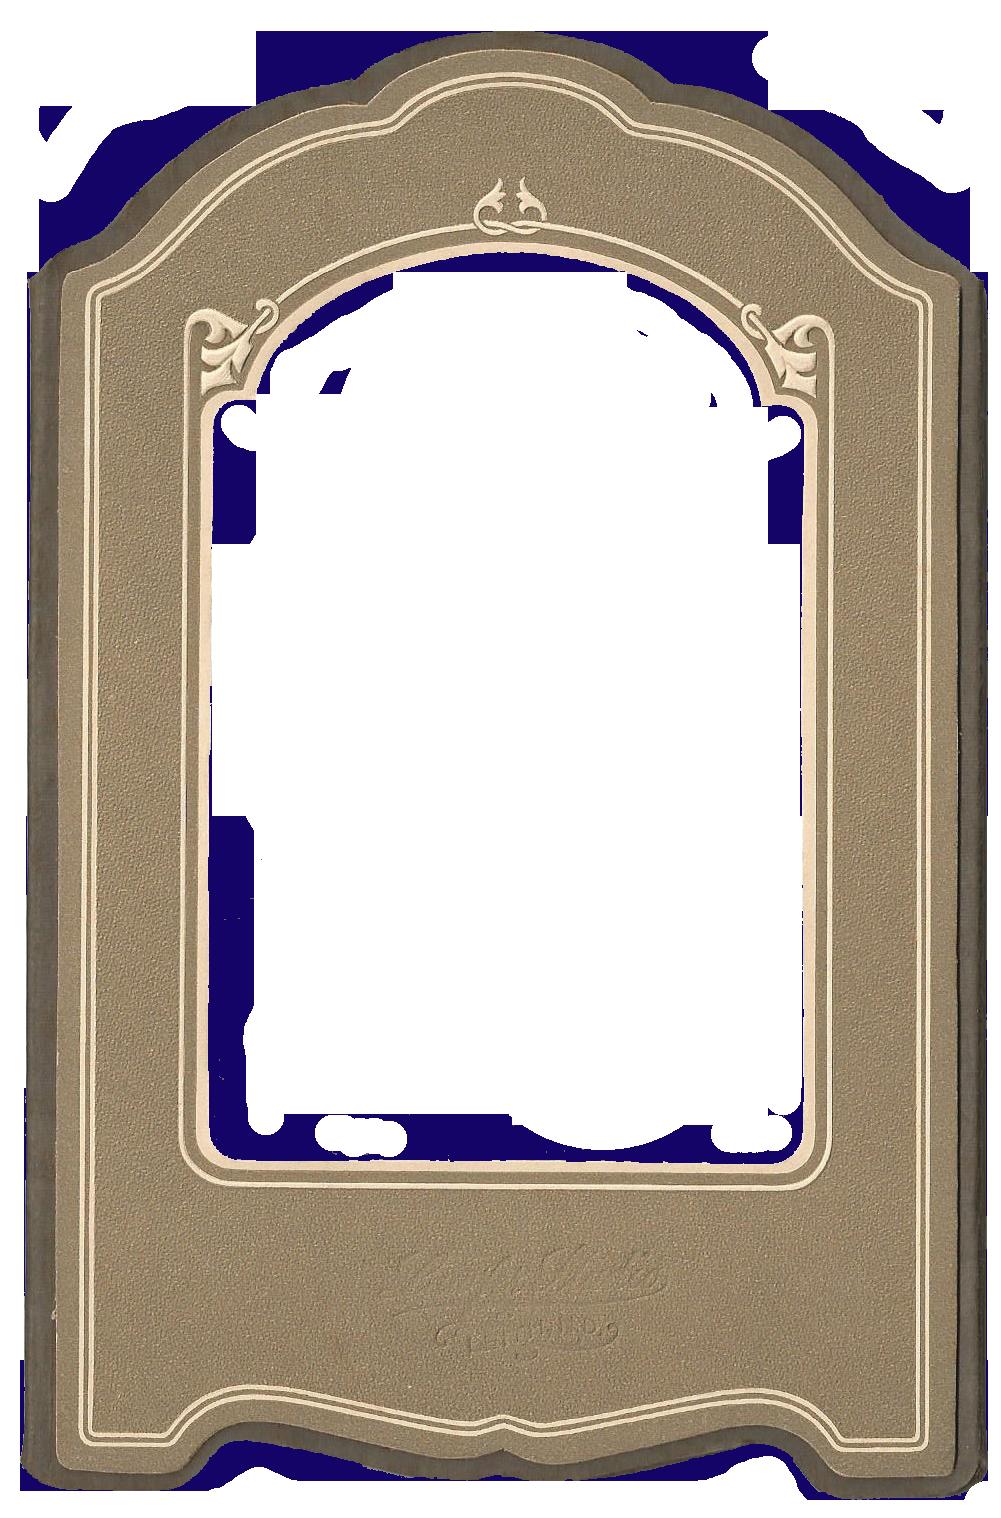 Vintage Photo Mat Frame Printable From Knickoftime Net Vintage Photo Frames Antique Photo Frames Vintage Photos